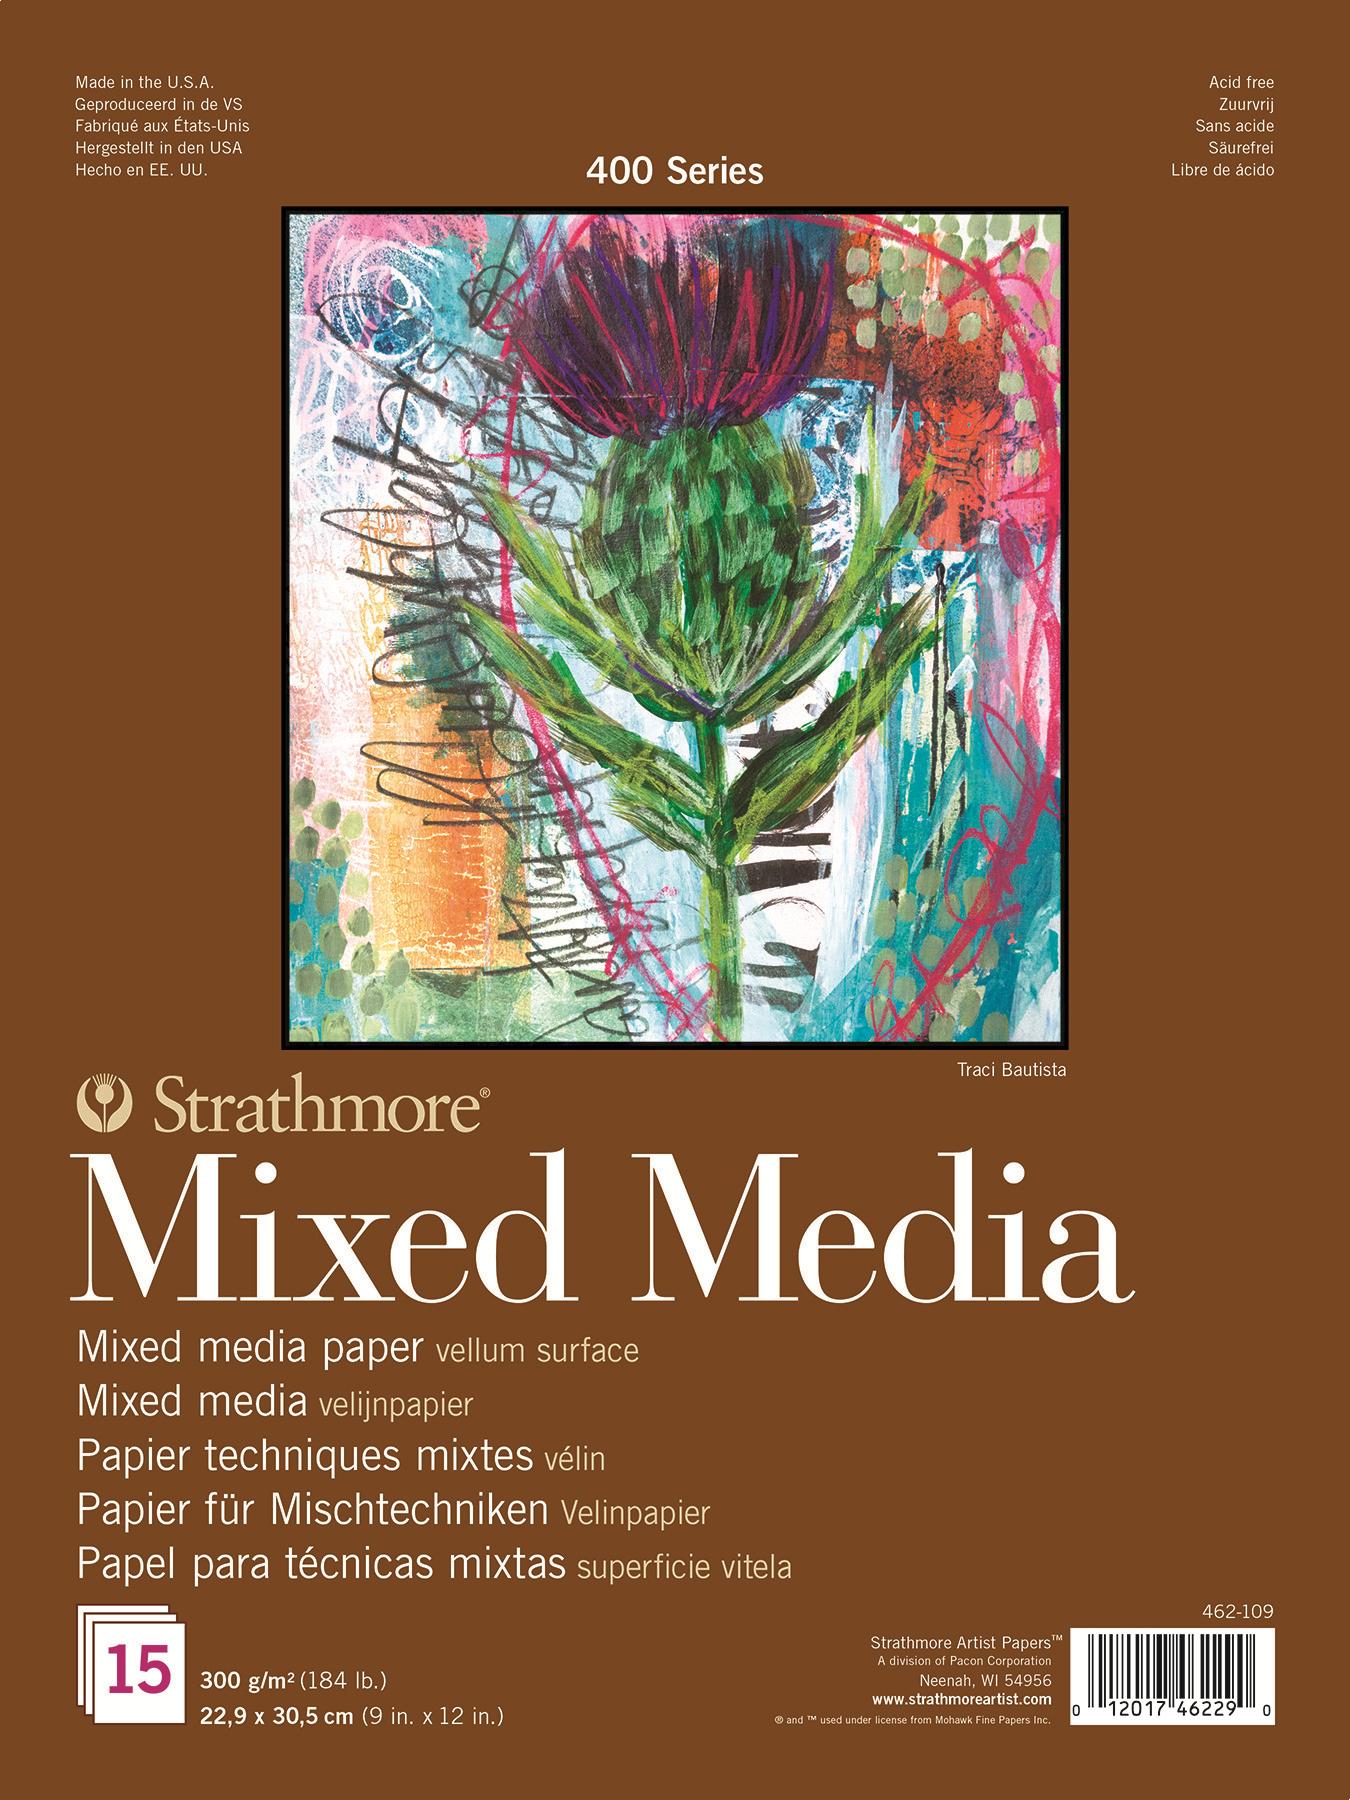 Strathmore Альбом для смешанных техник 400 Series 15 листов формат A4+ strathmore st360 111 300 series 11 x 15 cold press tape bound watercolor pad